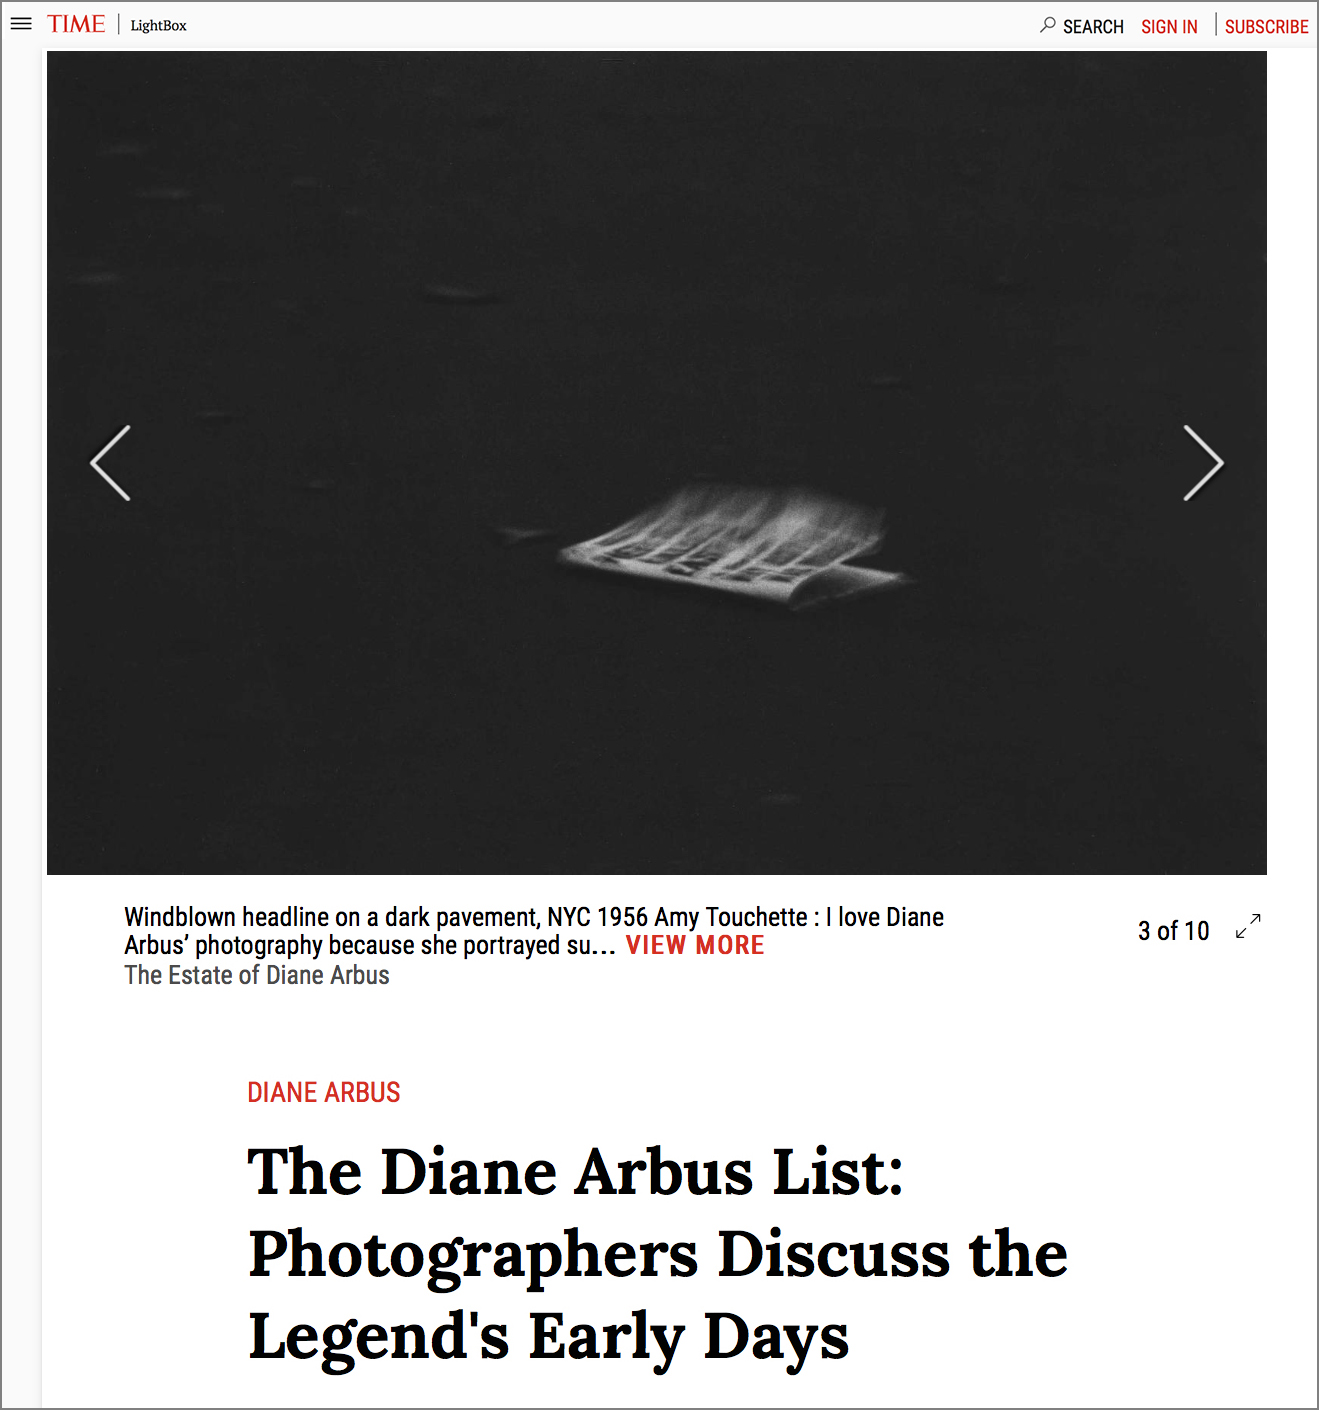 TIME LightBox,The Diane Arbus List - NOVEMBER 18, 2016 As Diane Arbus' landmark exhibition at the Met Breuer,